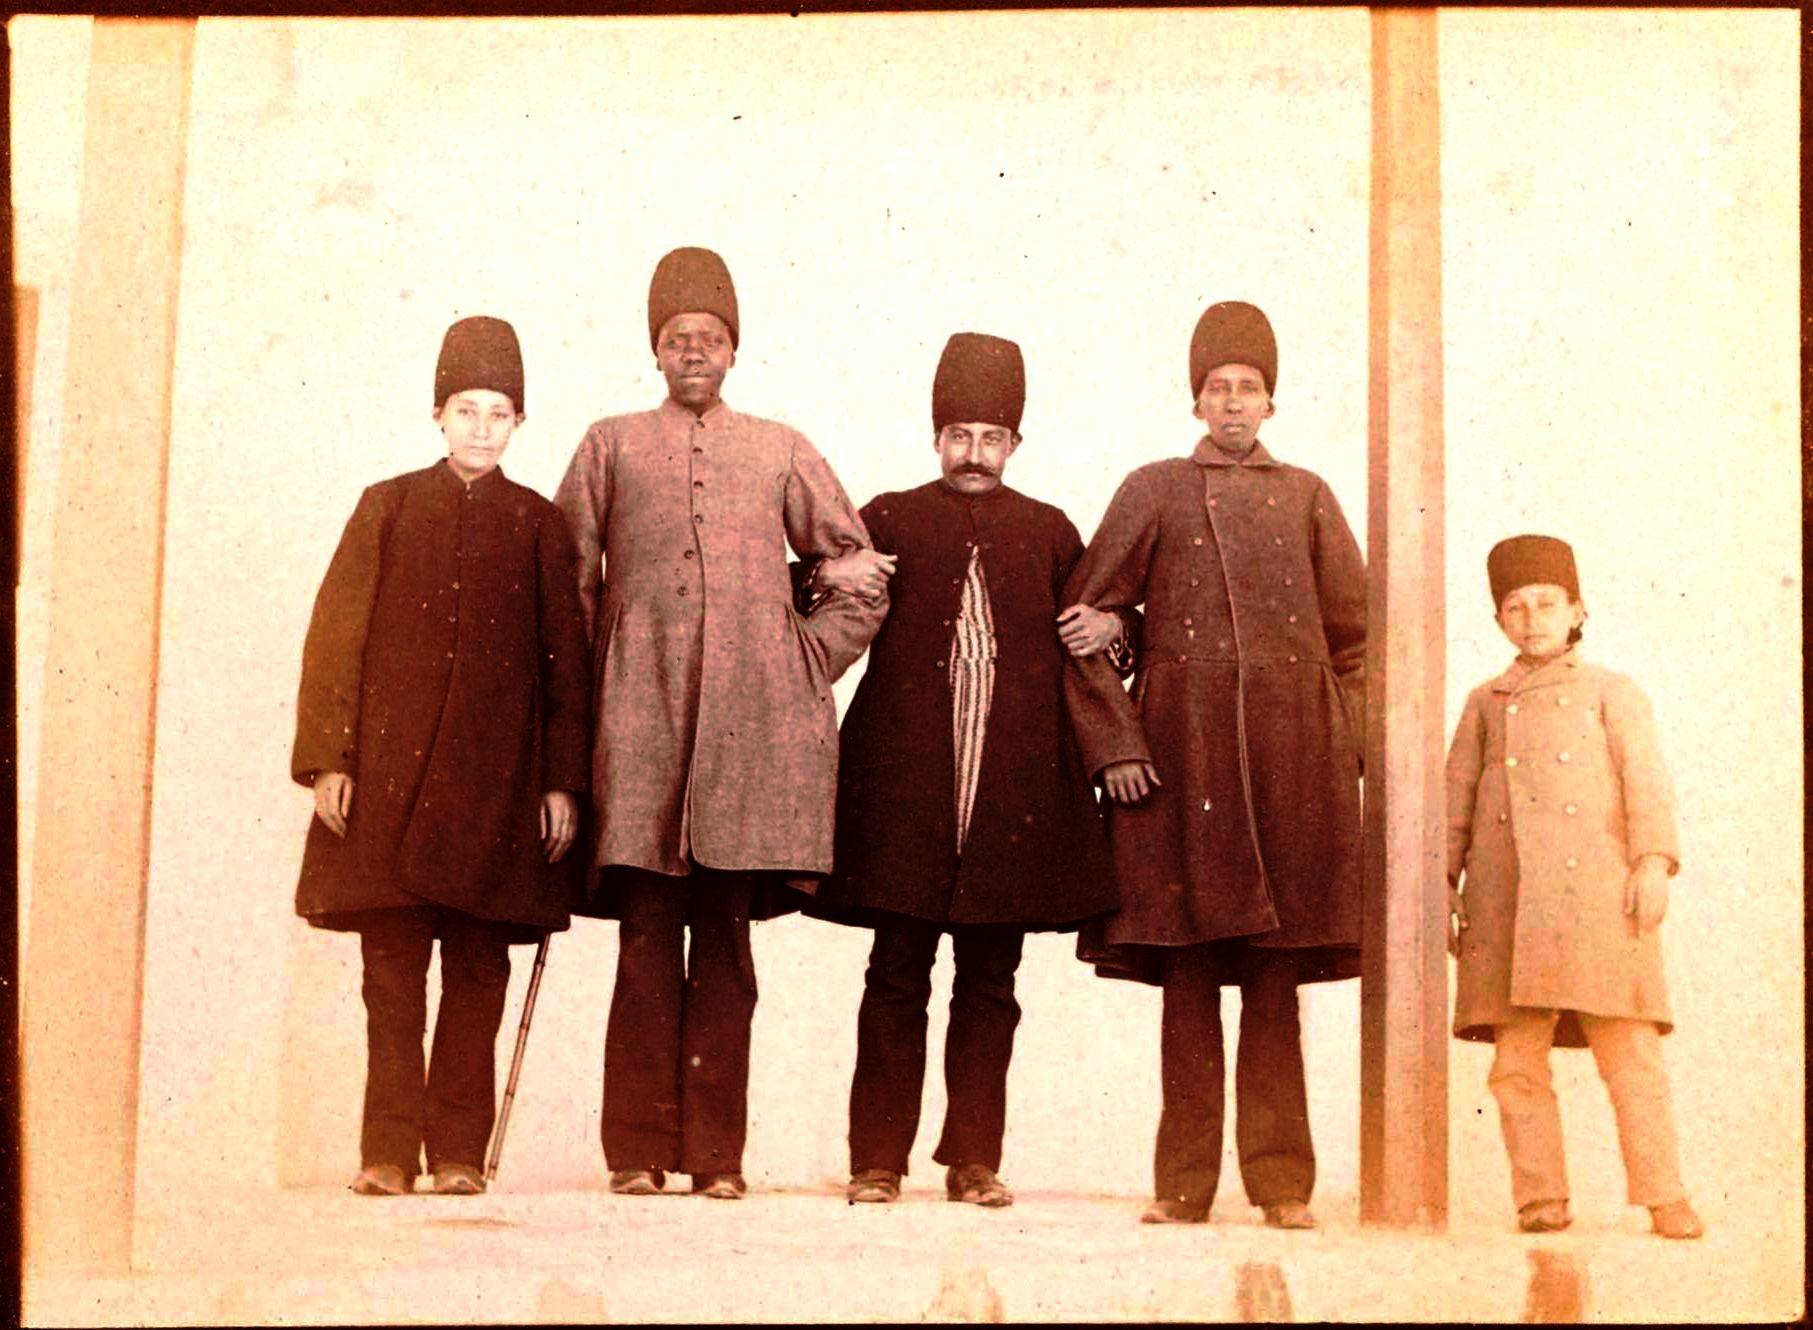 Абдул-Хоссейн Мирза Фарманфарма(30 марта, 1857 — 15 апреля 1939) — визирь Персии при Султан Ахма